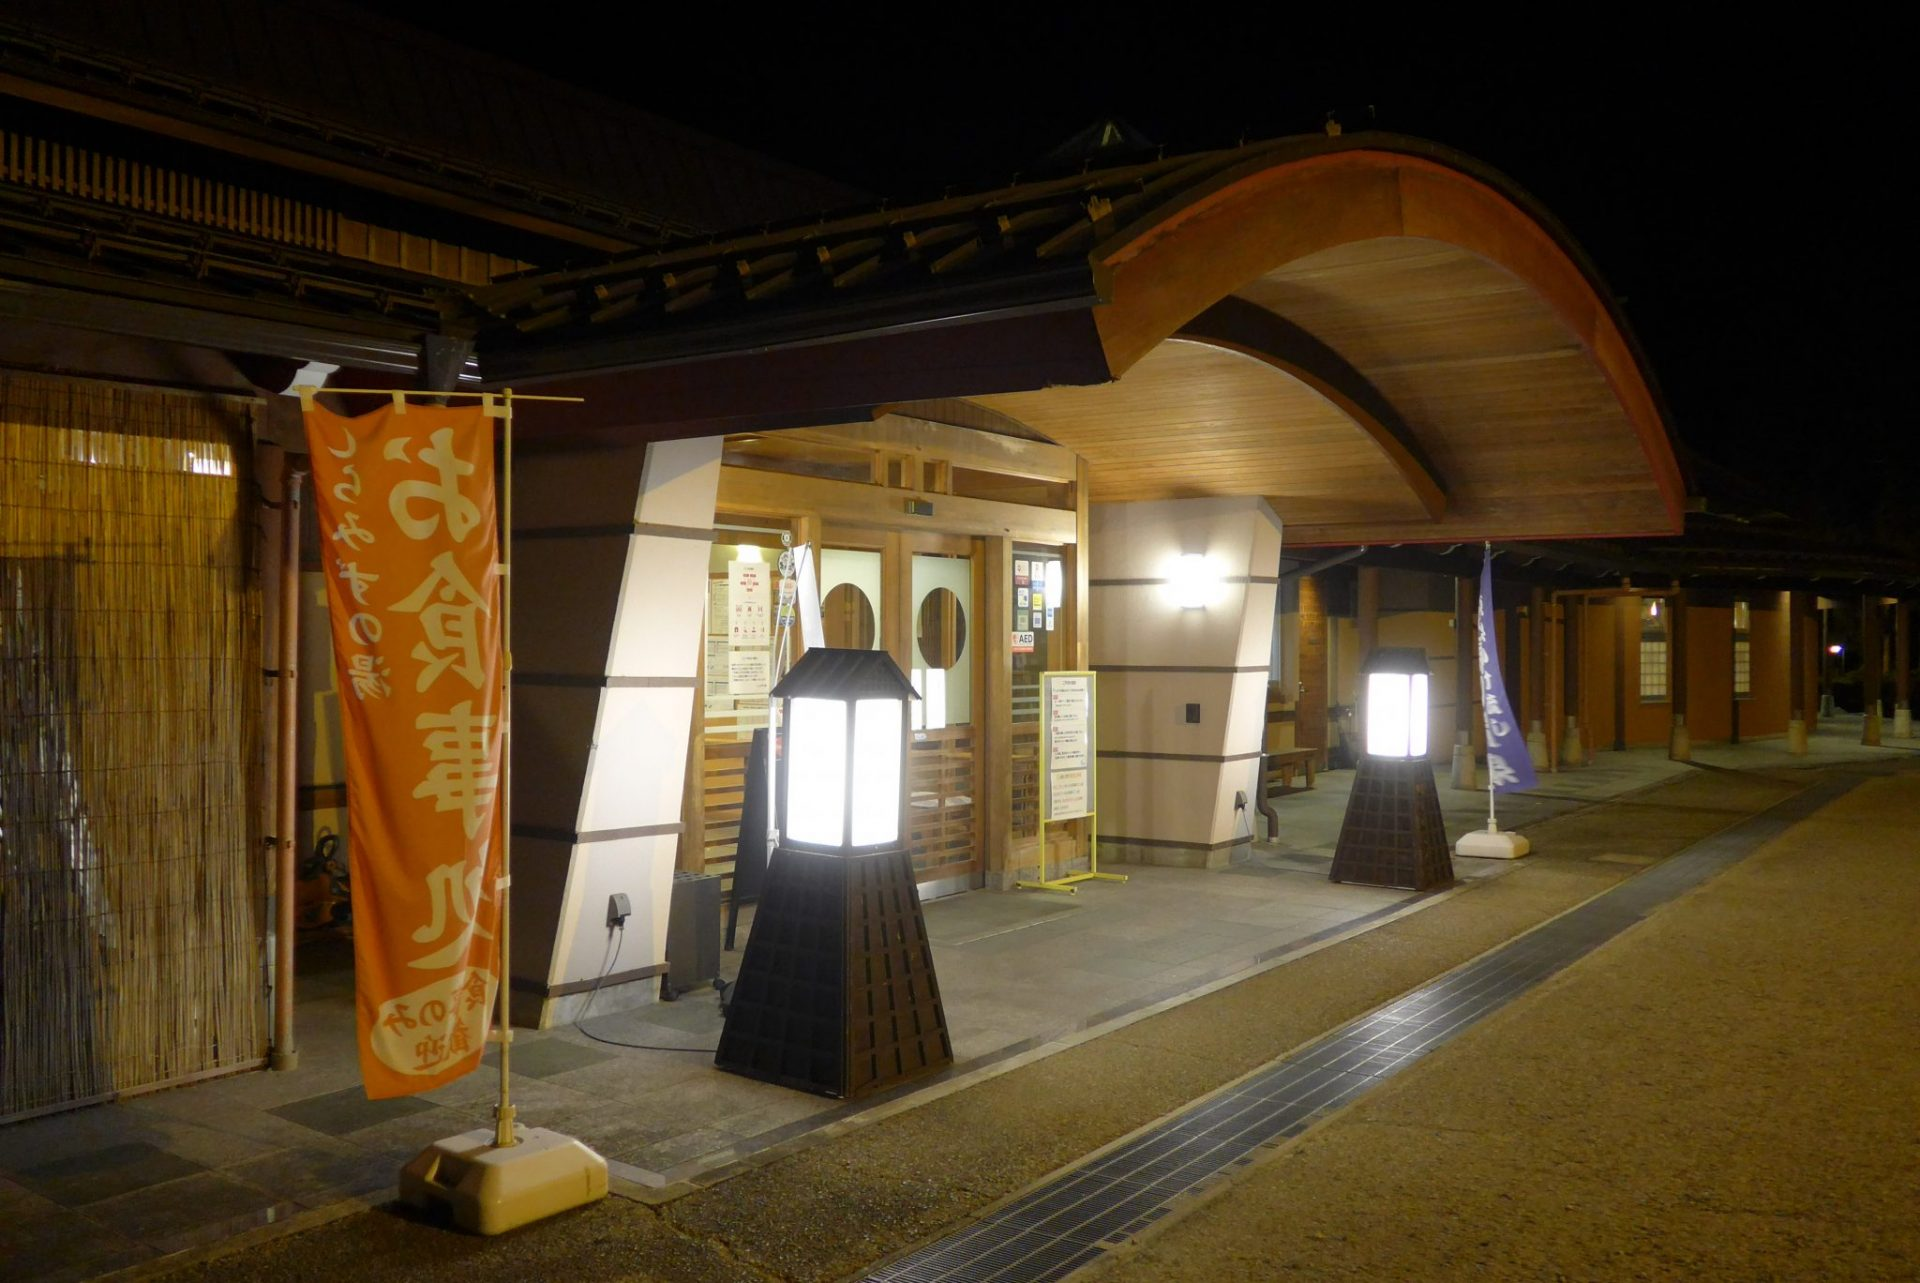 (K)大白川温泉しらみずの湯〜道の駅飛騨白山に併設で車中泊に便利